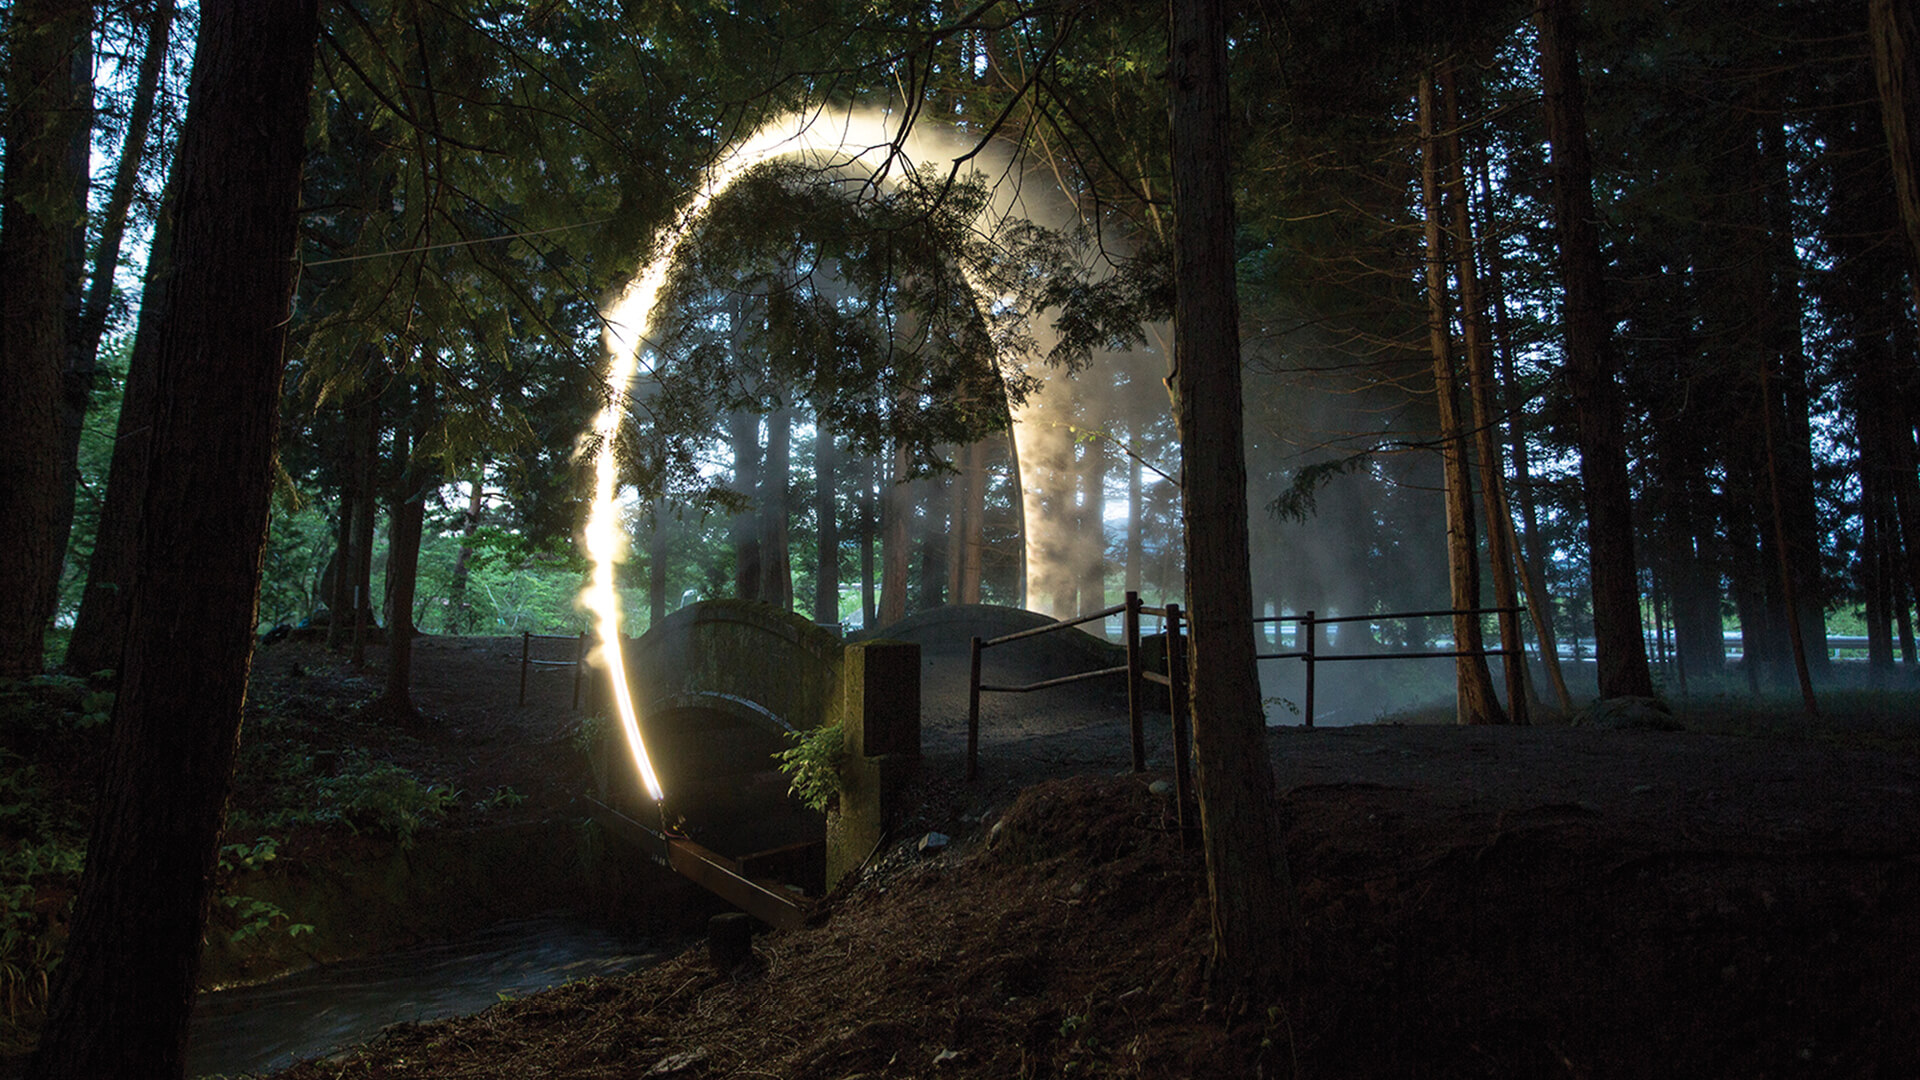 Arc Zero Nimbus installed for the Japan Alps Art Festival | James Tapscott| STIRworld